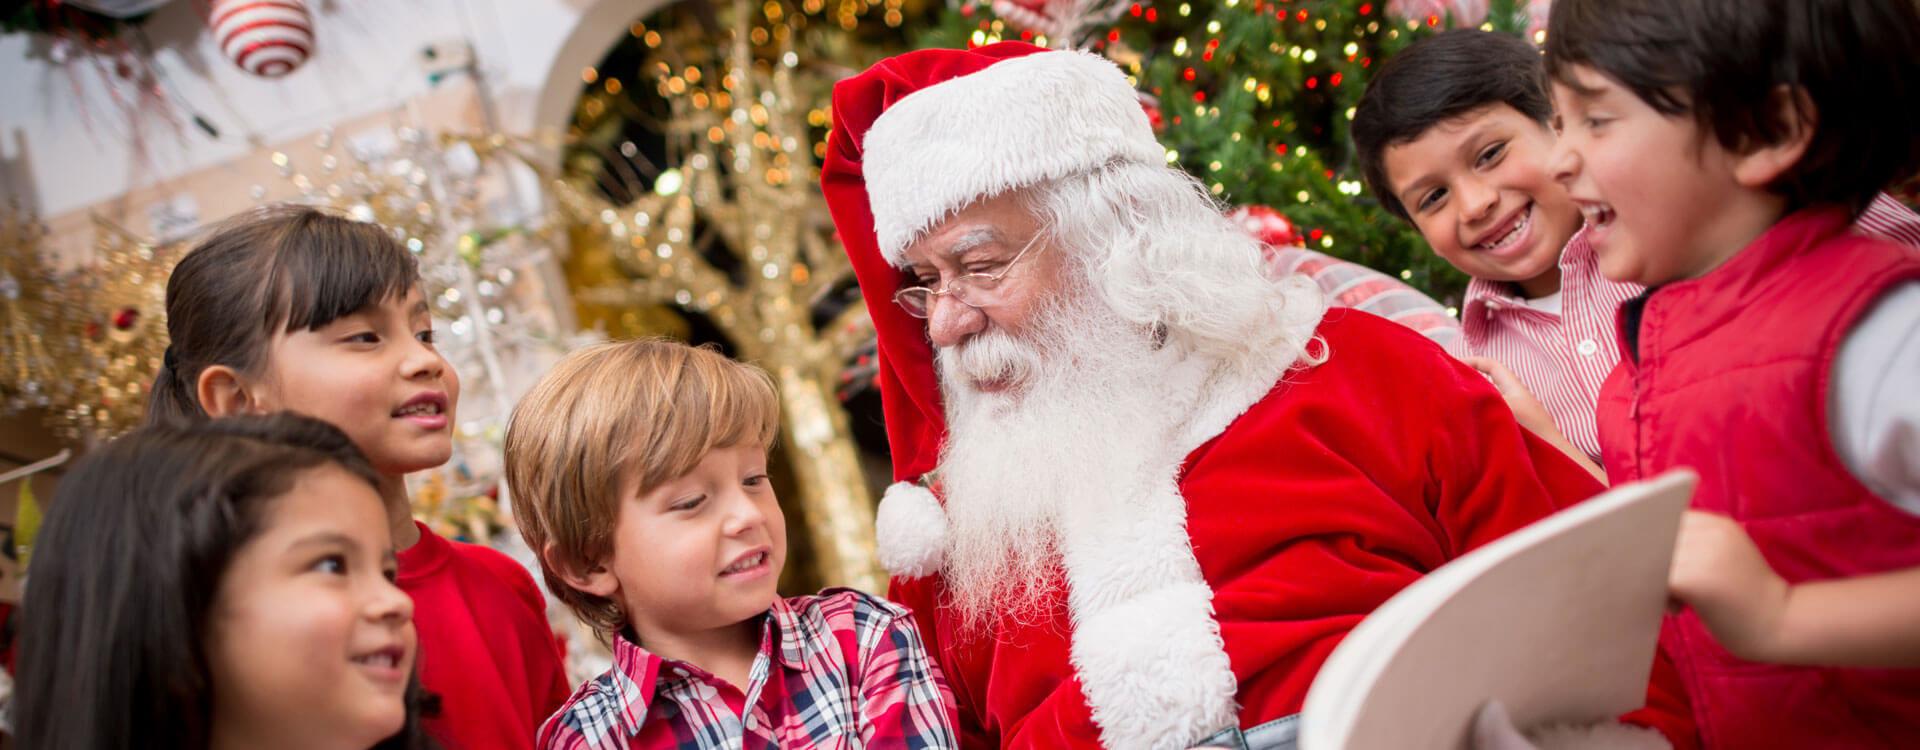 Santa in Wisconsin Dells